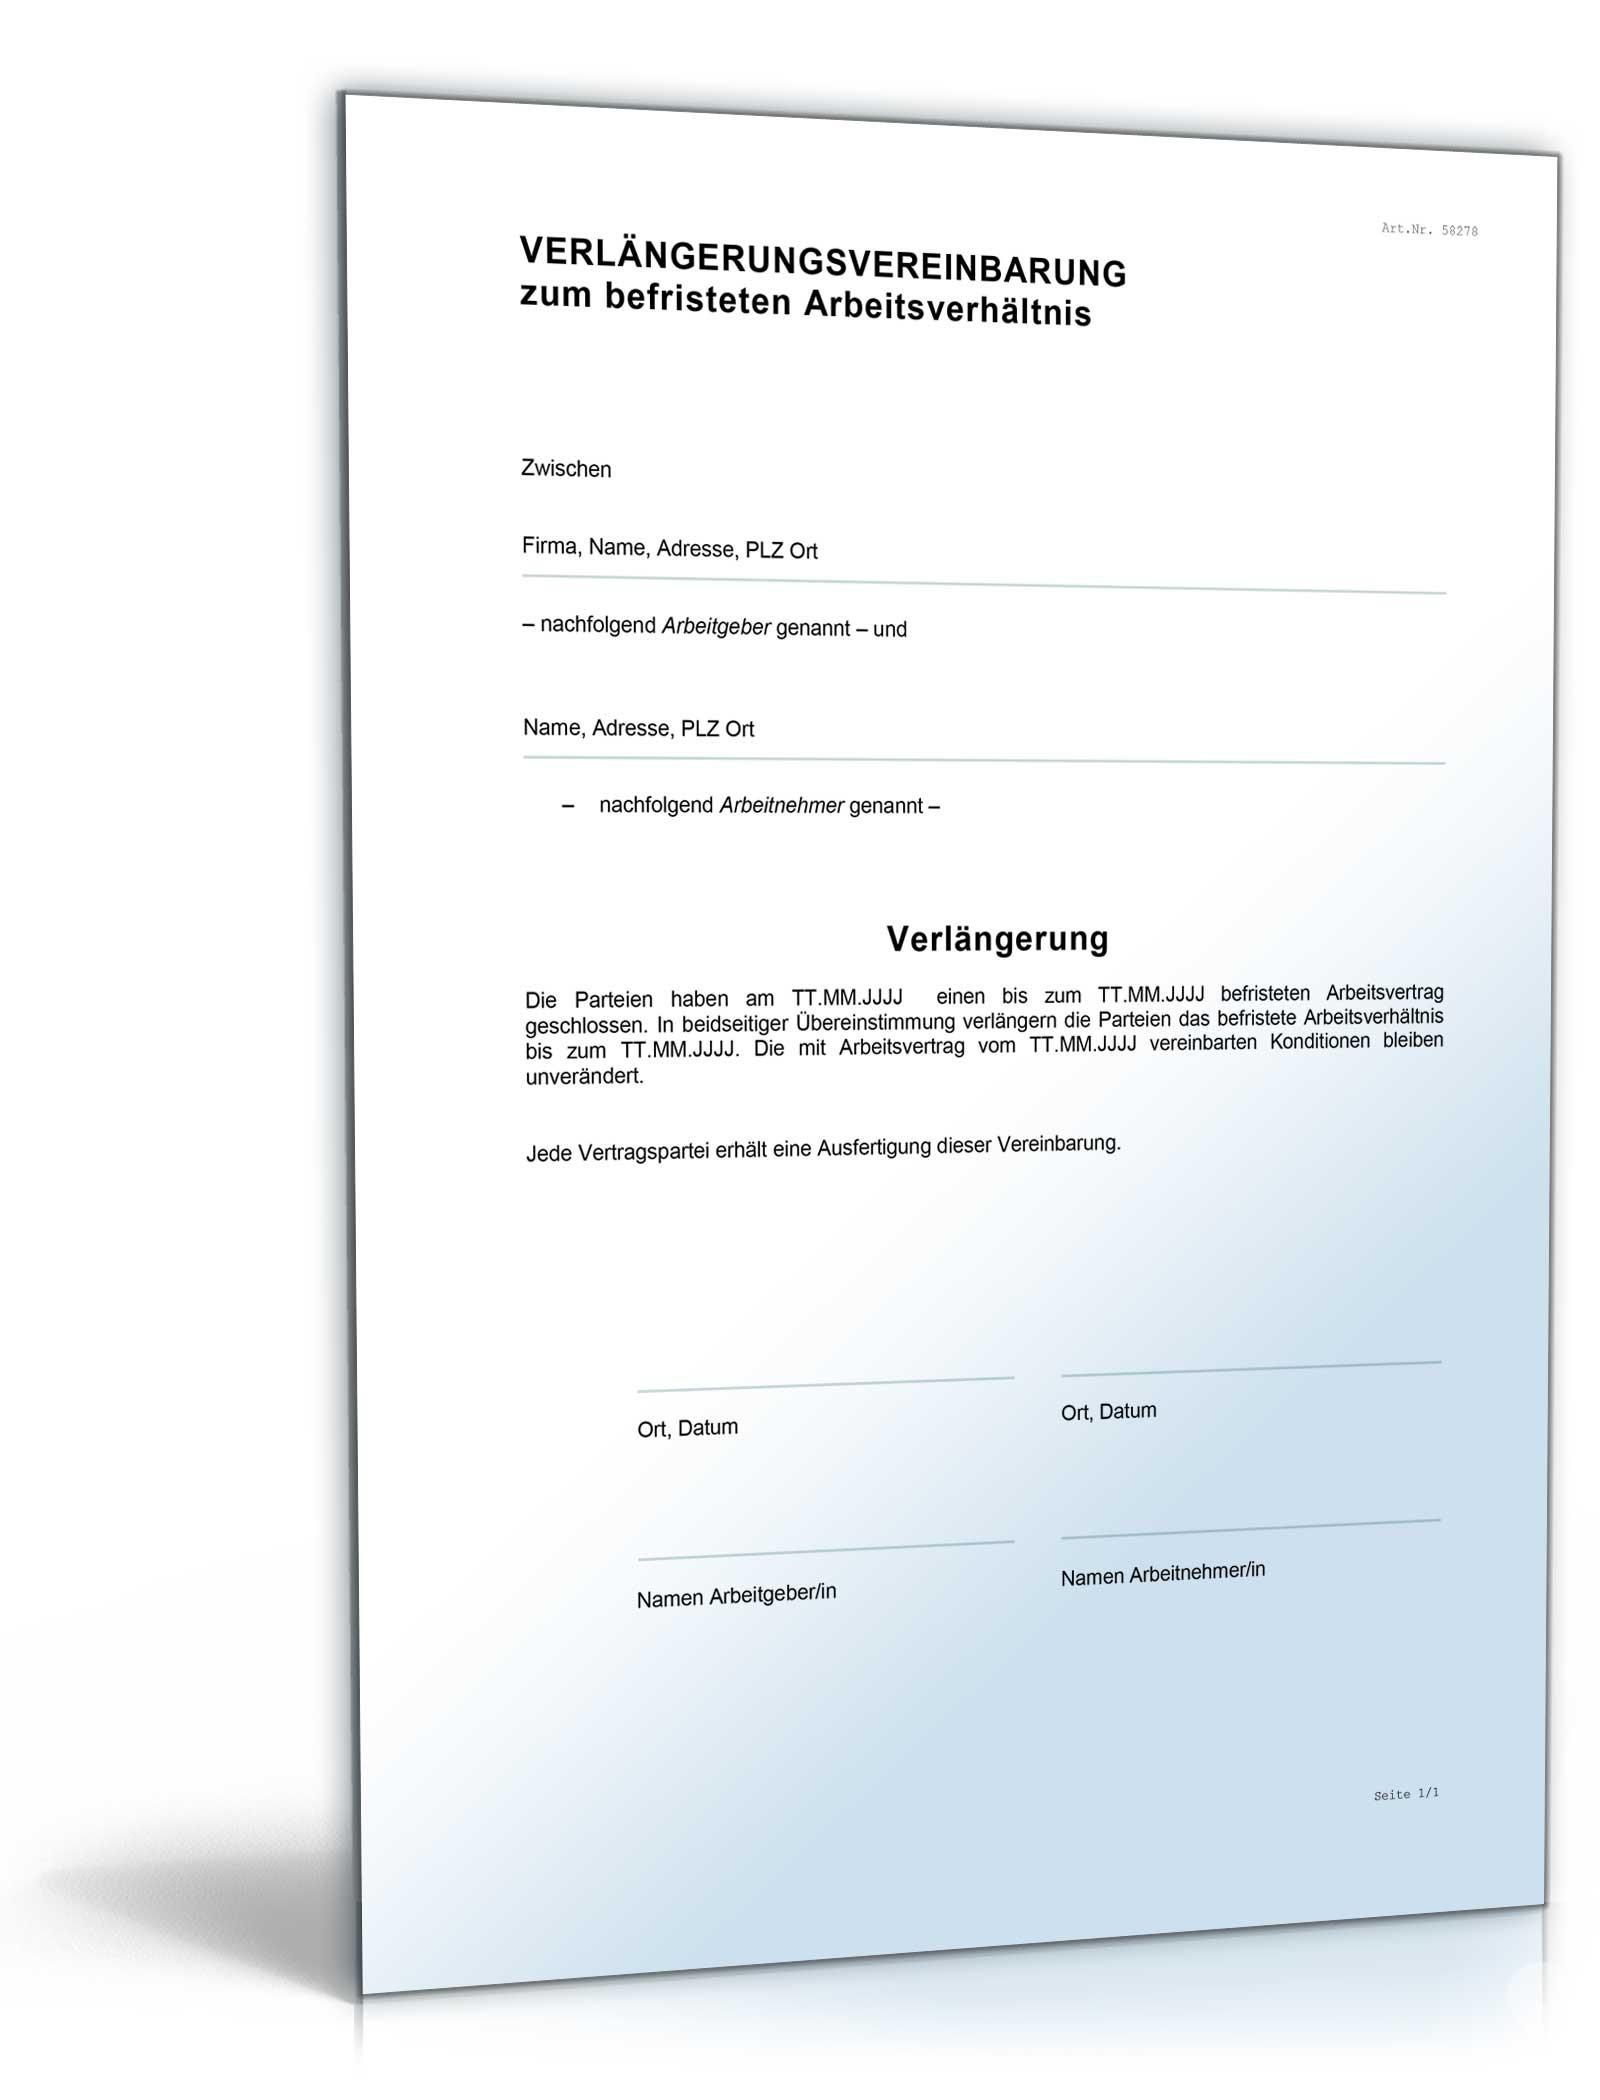 vereinbarung verlngerung - Verlangerung Probezeit Muster